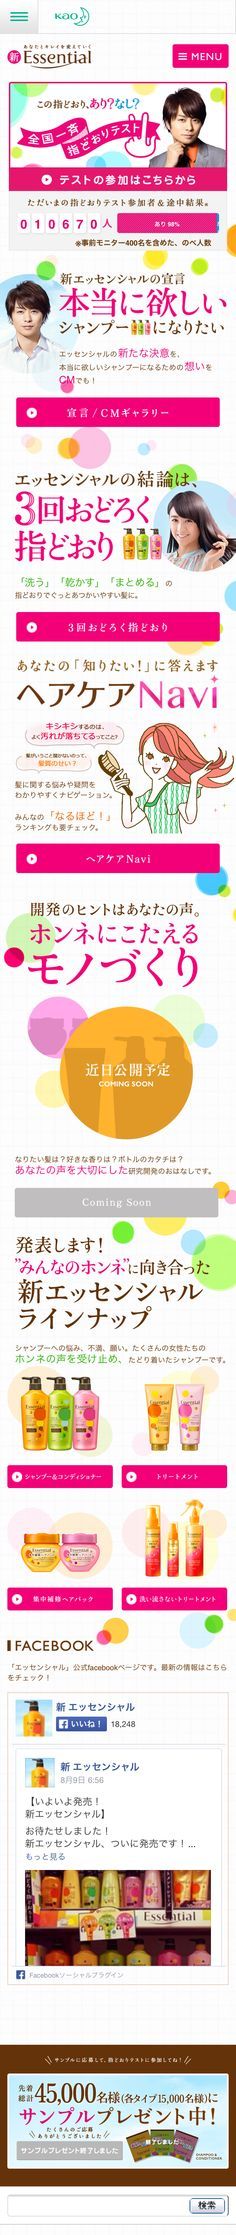 Web Japan, Mobile Web Design, Site Design, Smartphone, Banner, Typography, Graphic Design, Website, Layouts